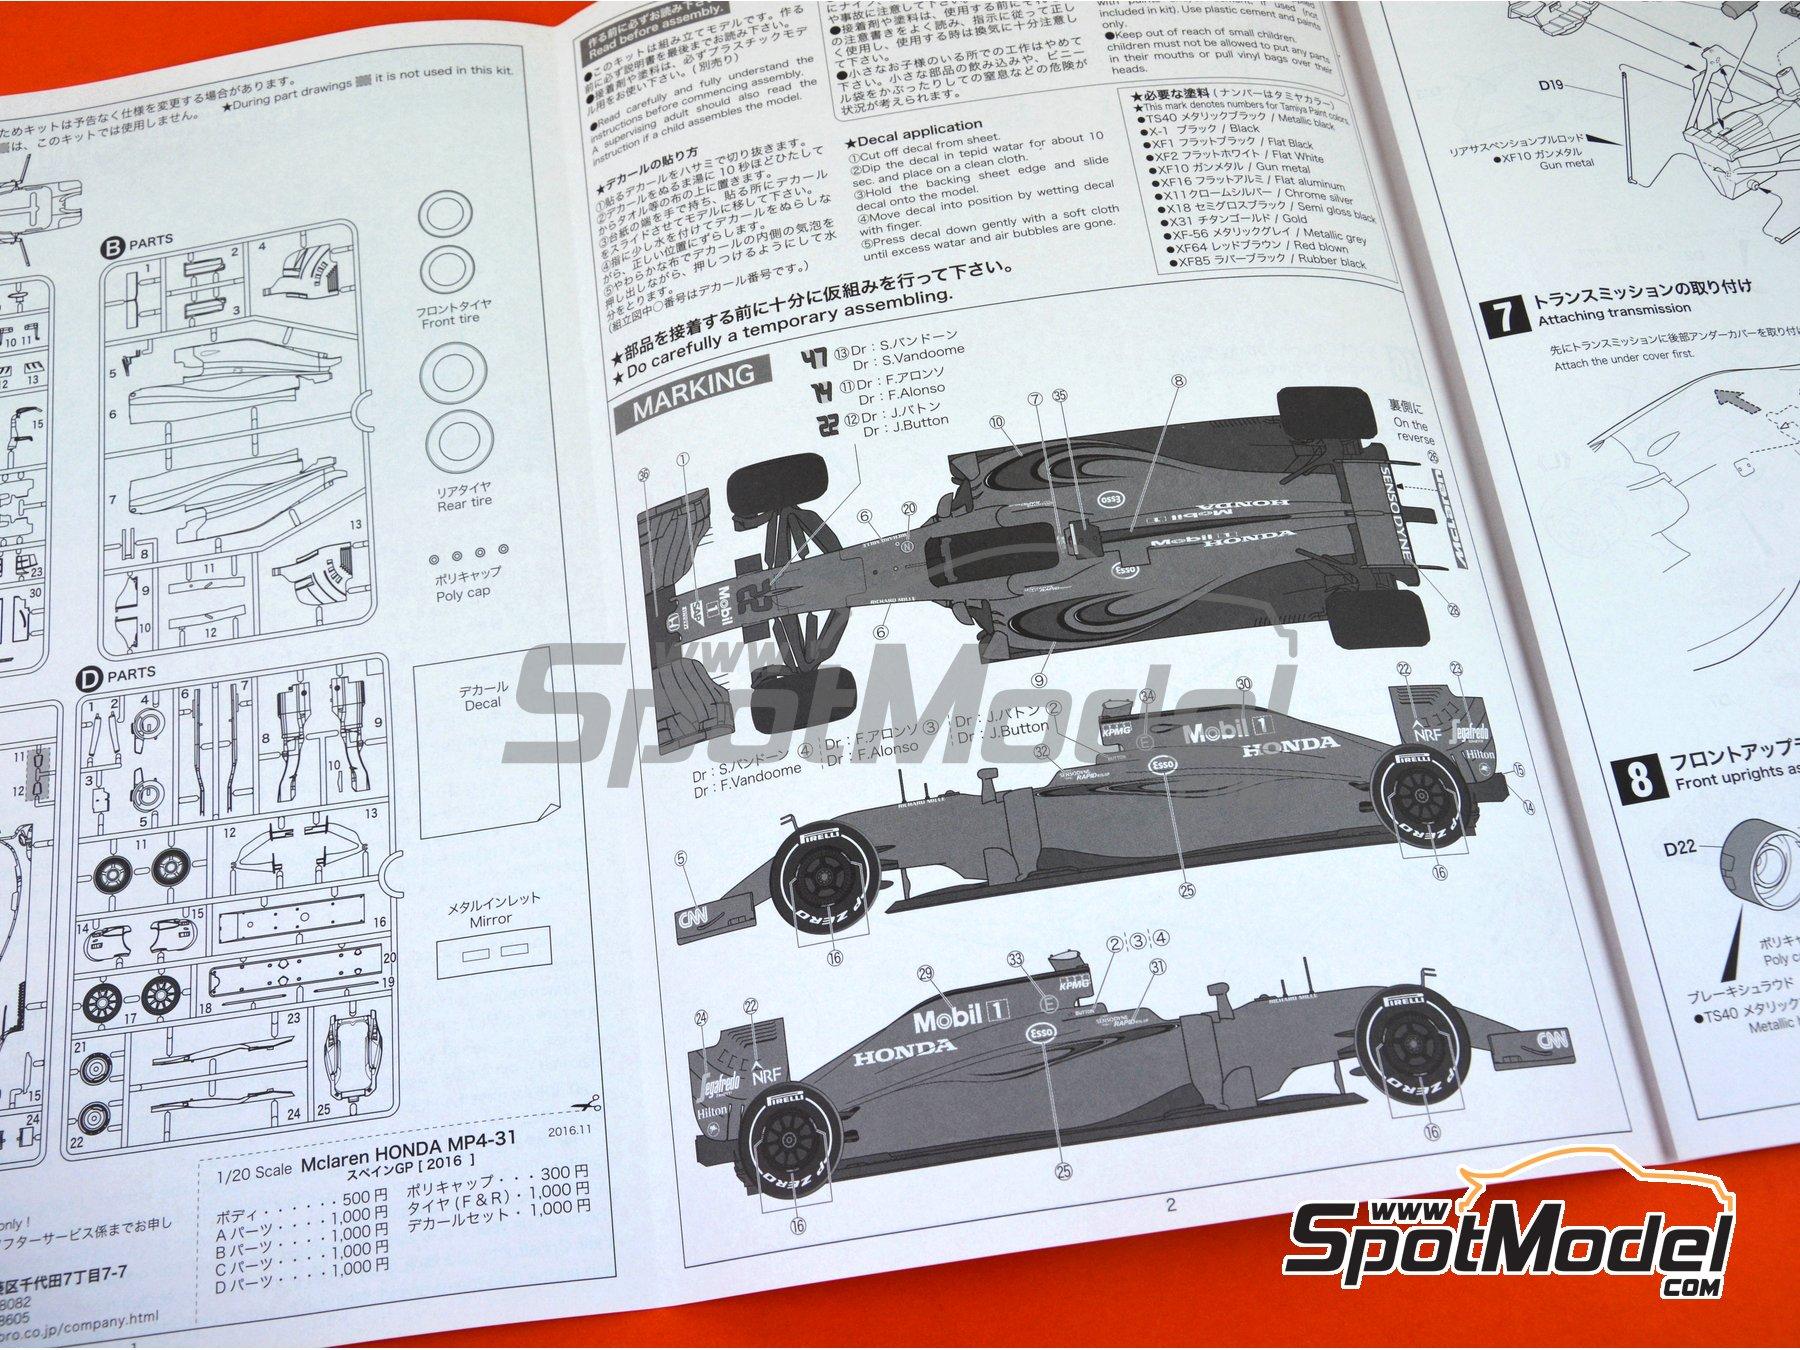 Image 23: McLaren Honda MP4/31 - Gran Premio de España 2016 | Maqueta de coche en escala1/20 fabricado por Ebbro (ref.EBR20018)